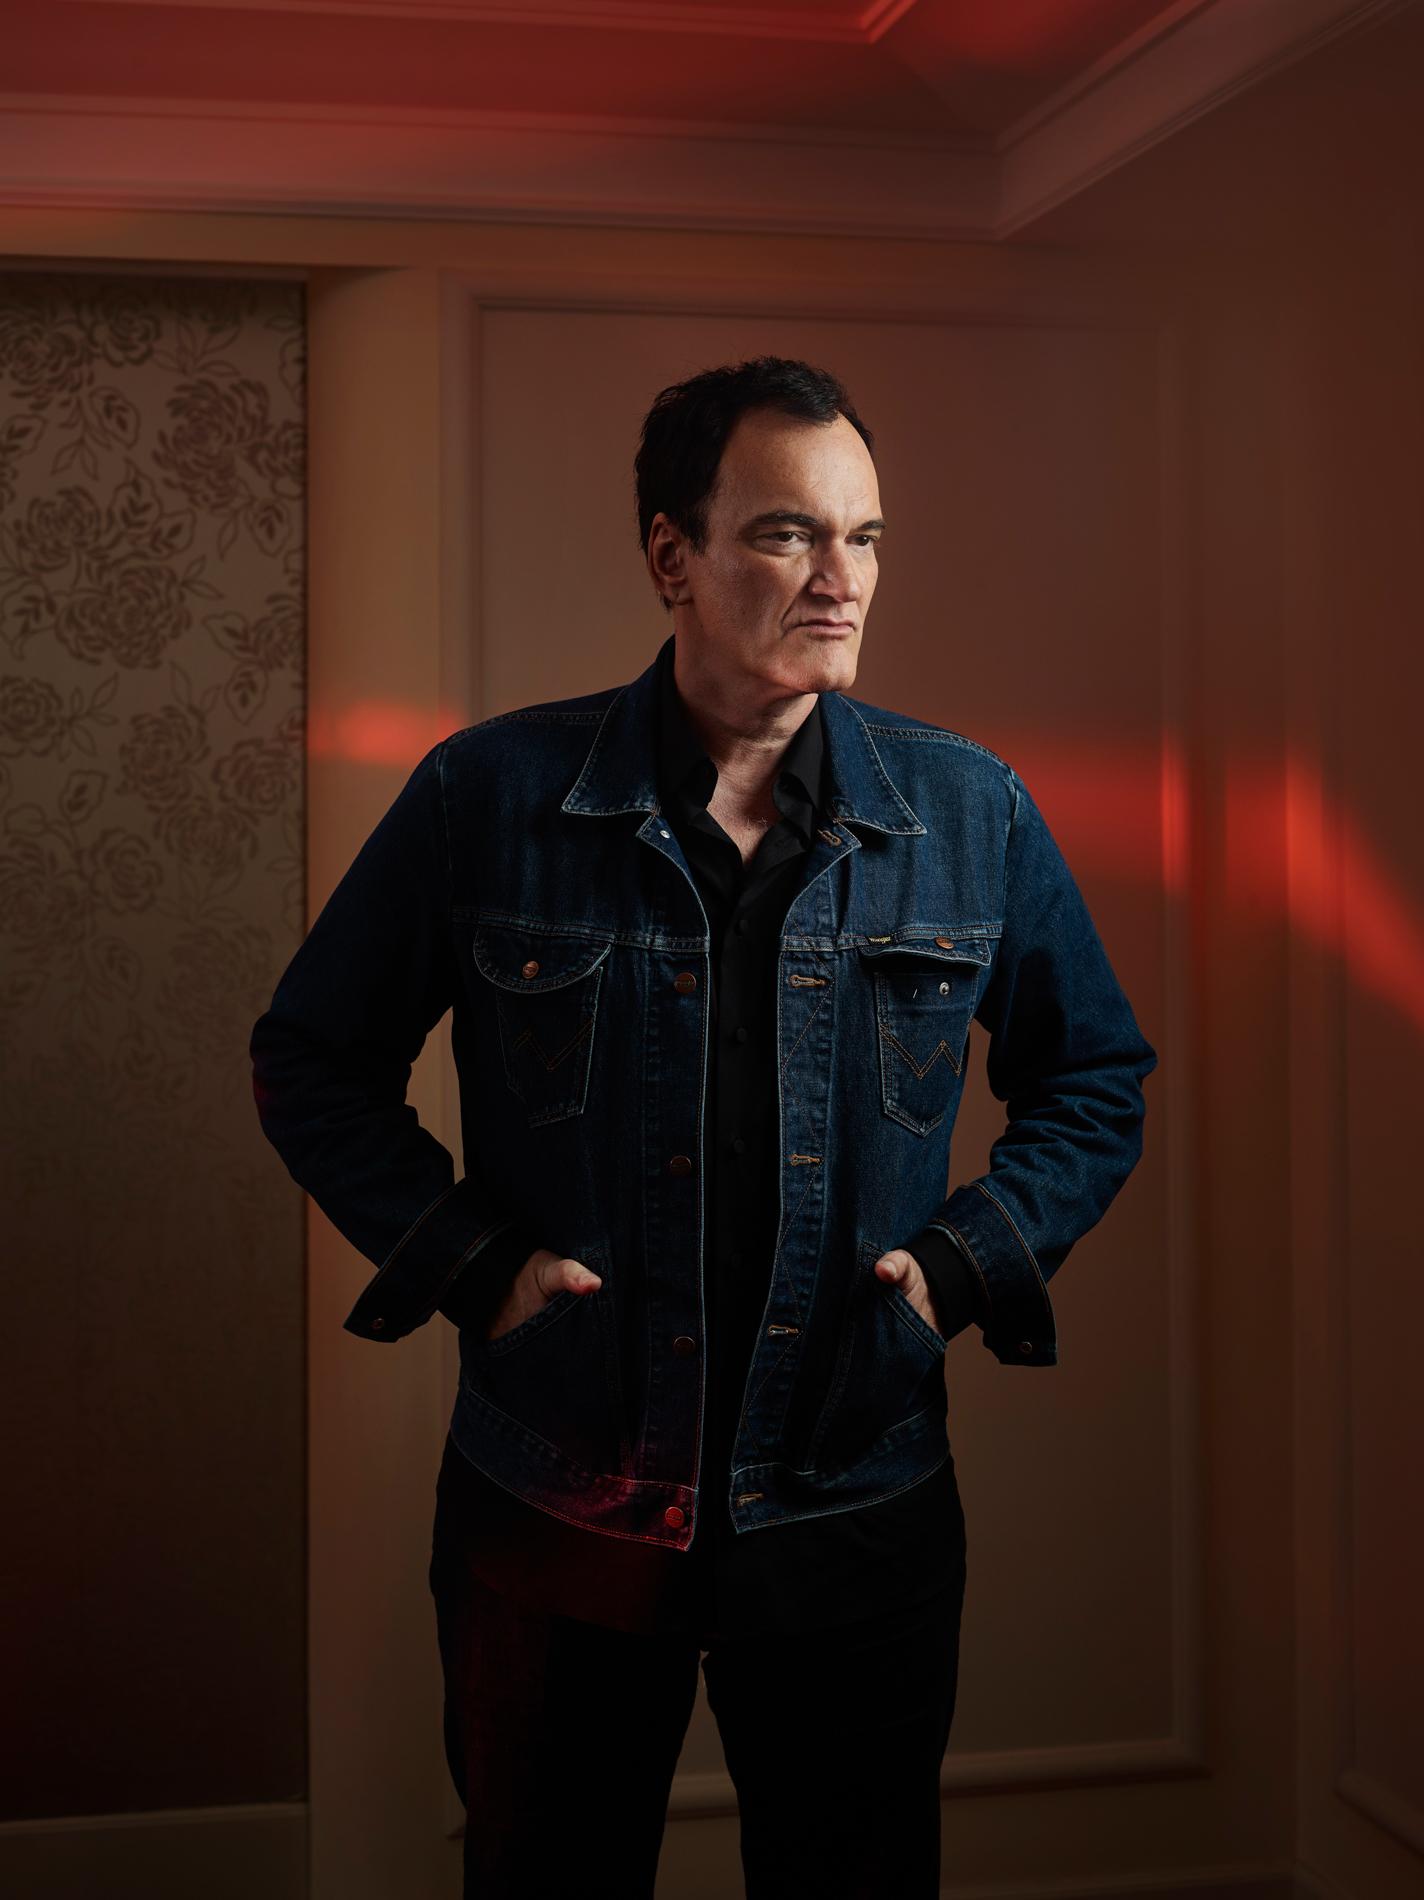 Quentin Tarantino for Le Monde